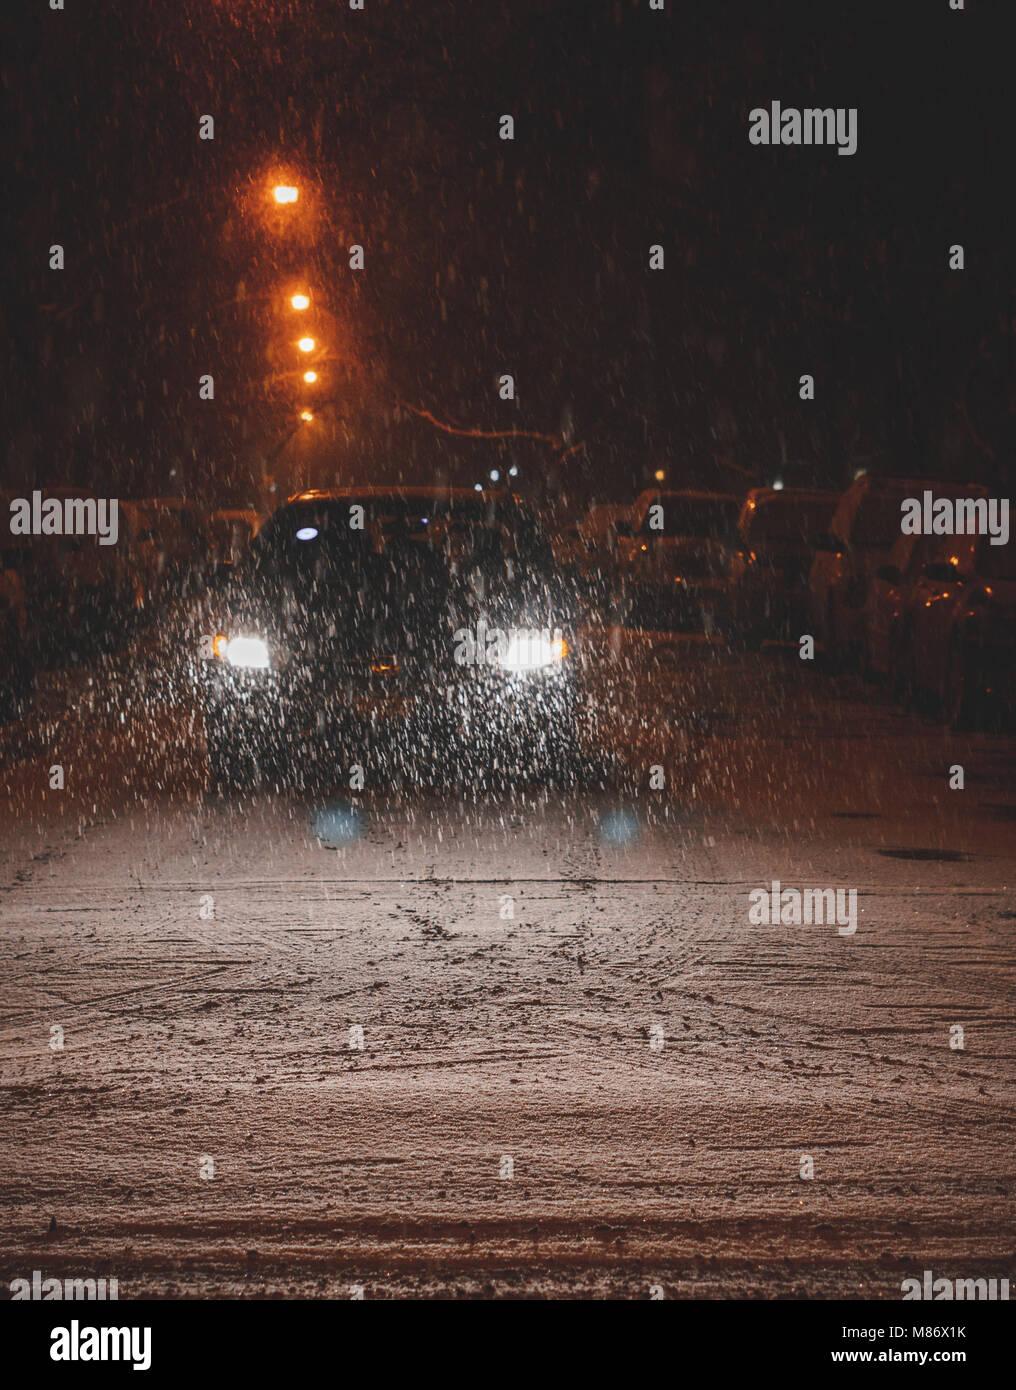 Auto fahren in den Schnee, Chicago, Amerika, USA Stockbild